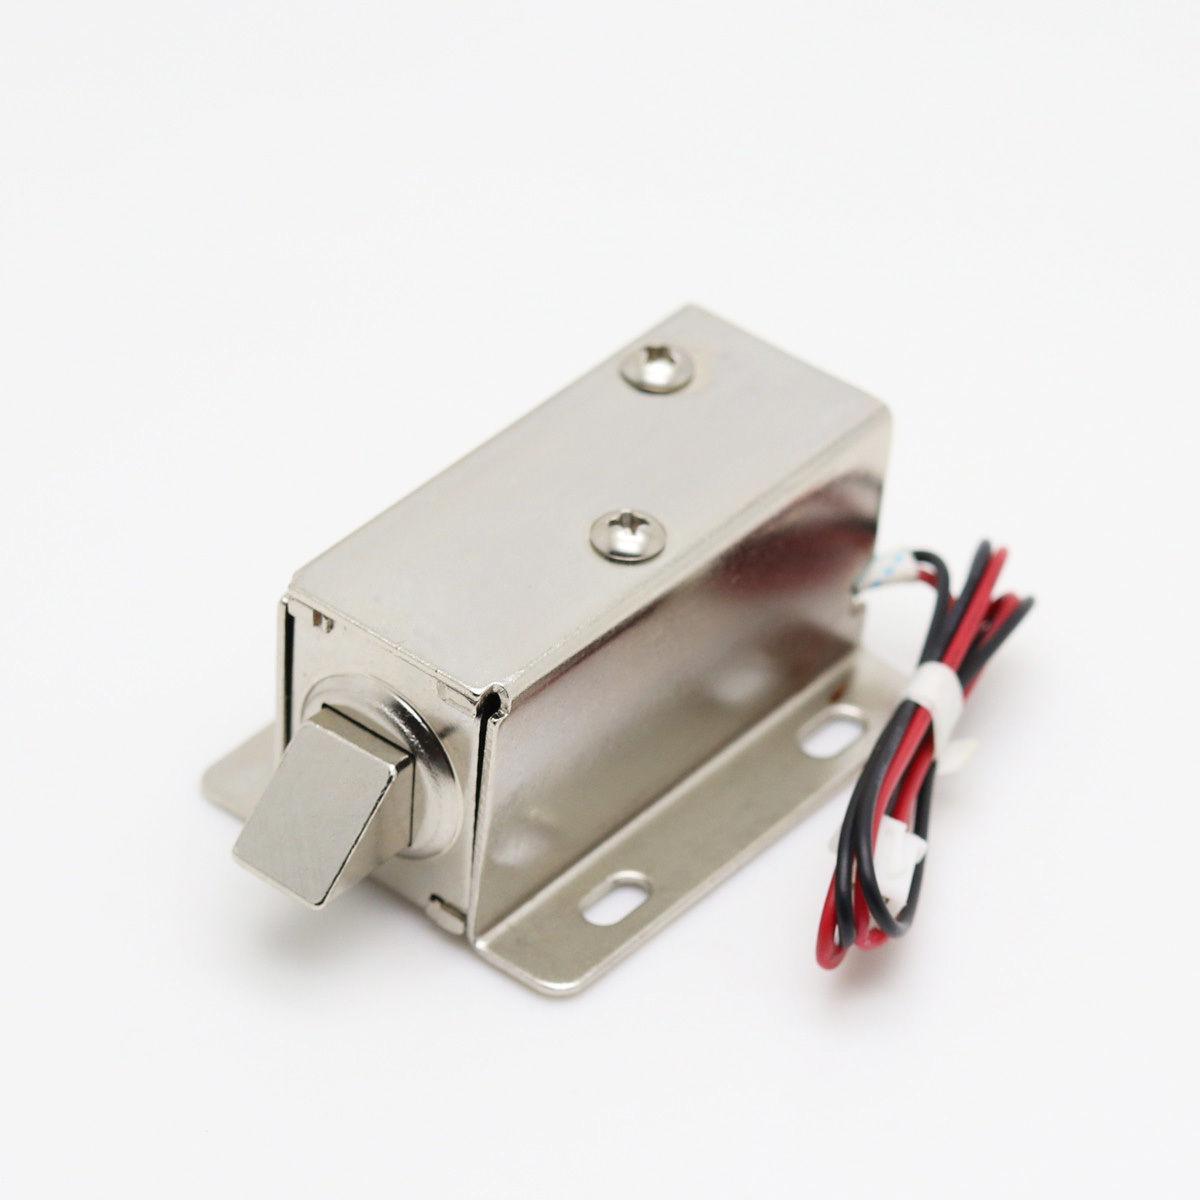 Elektronik Dolap Kapısı Kilidi için 12V DC Solenoid Elektromıknatıs